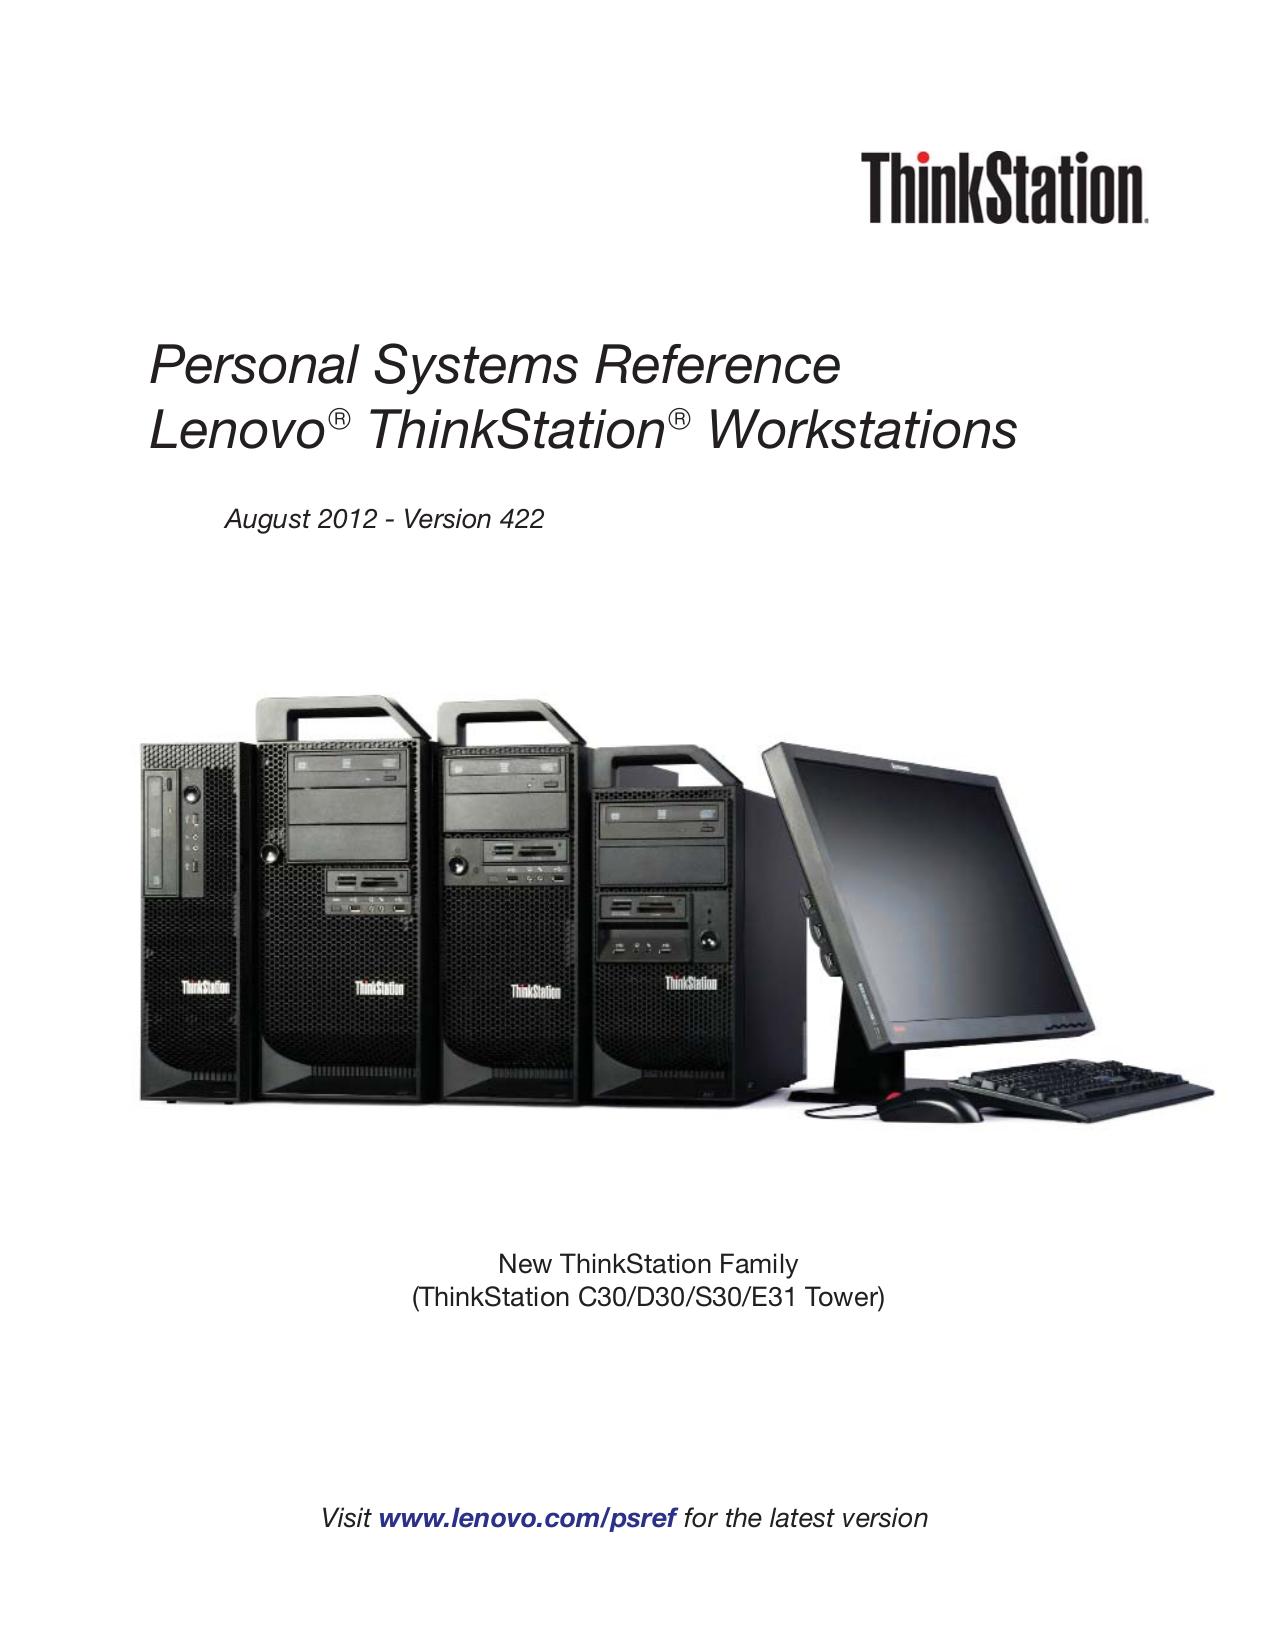 pdf for Lenovo Desktop ThinkStation C20x 4269 manual